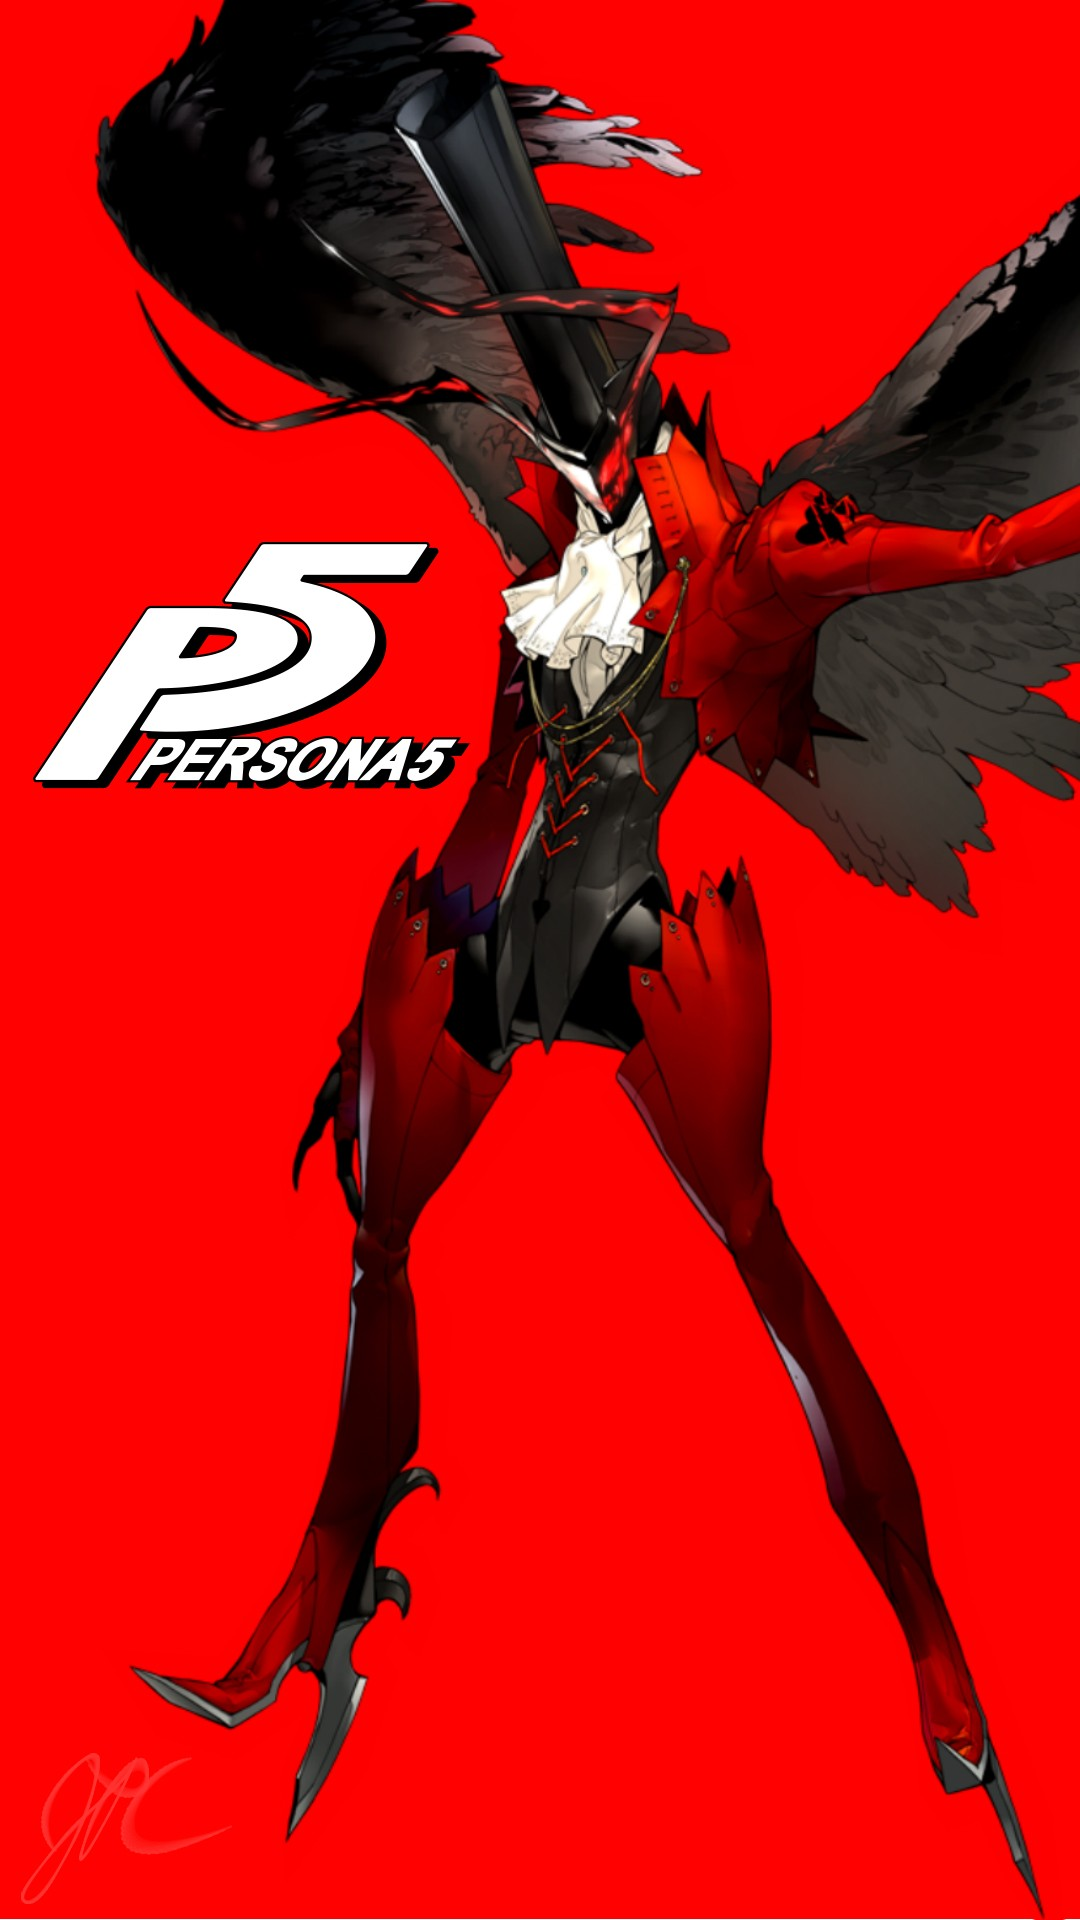 persona 5 download